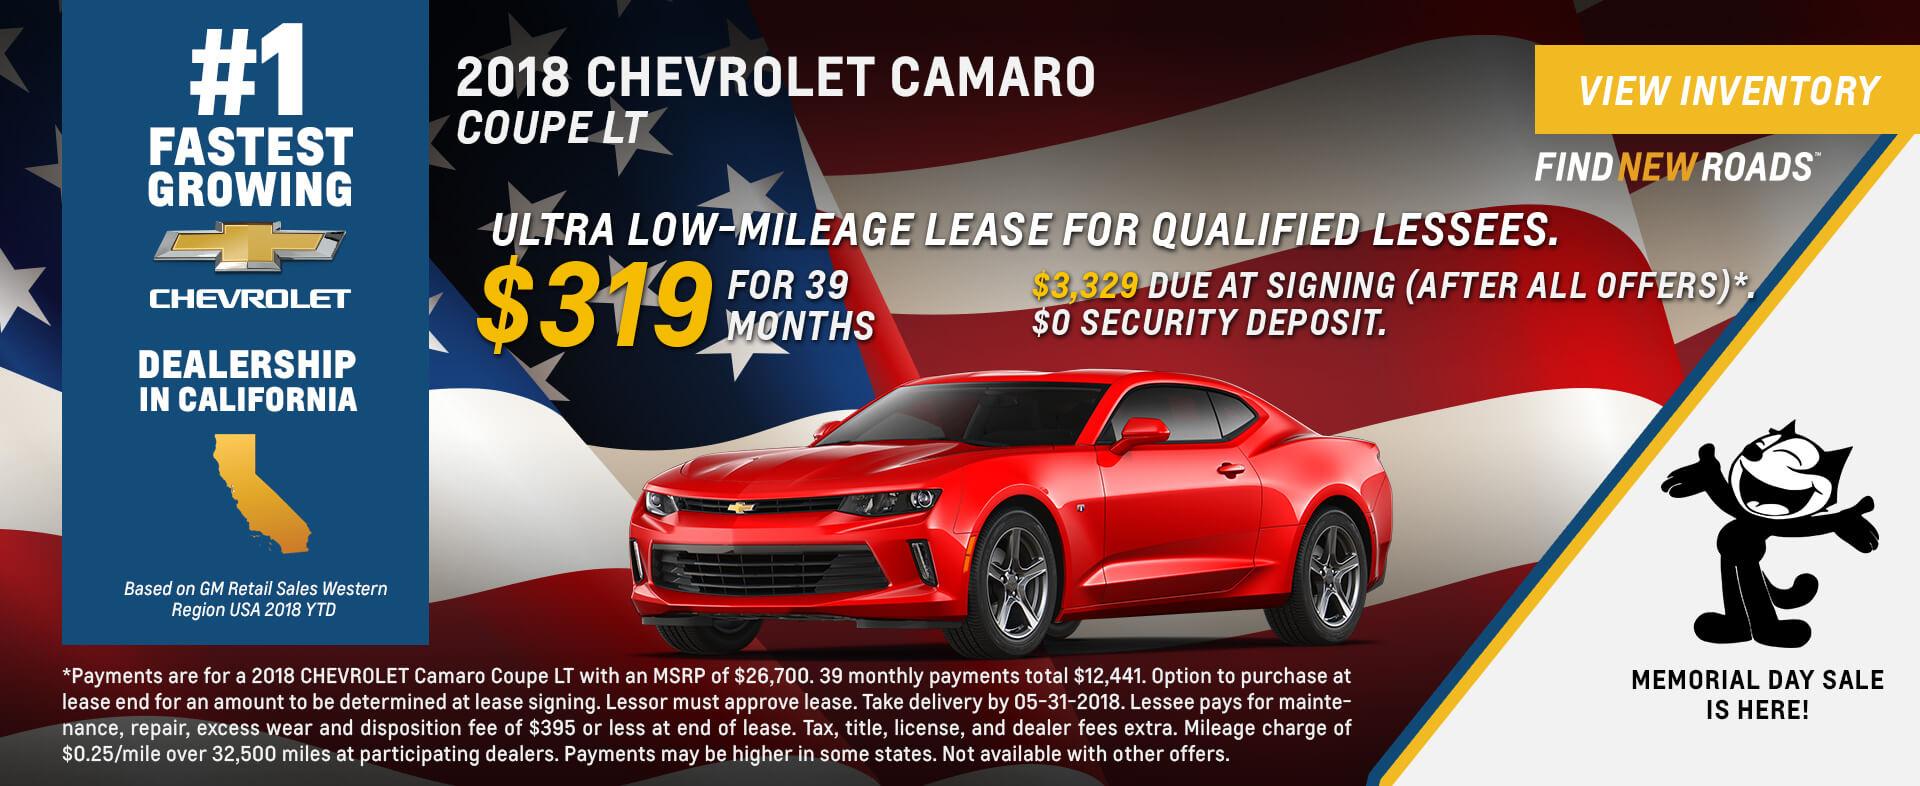 Chevrolet Camaro $319 Lease